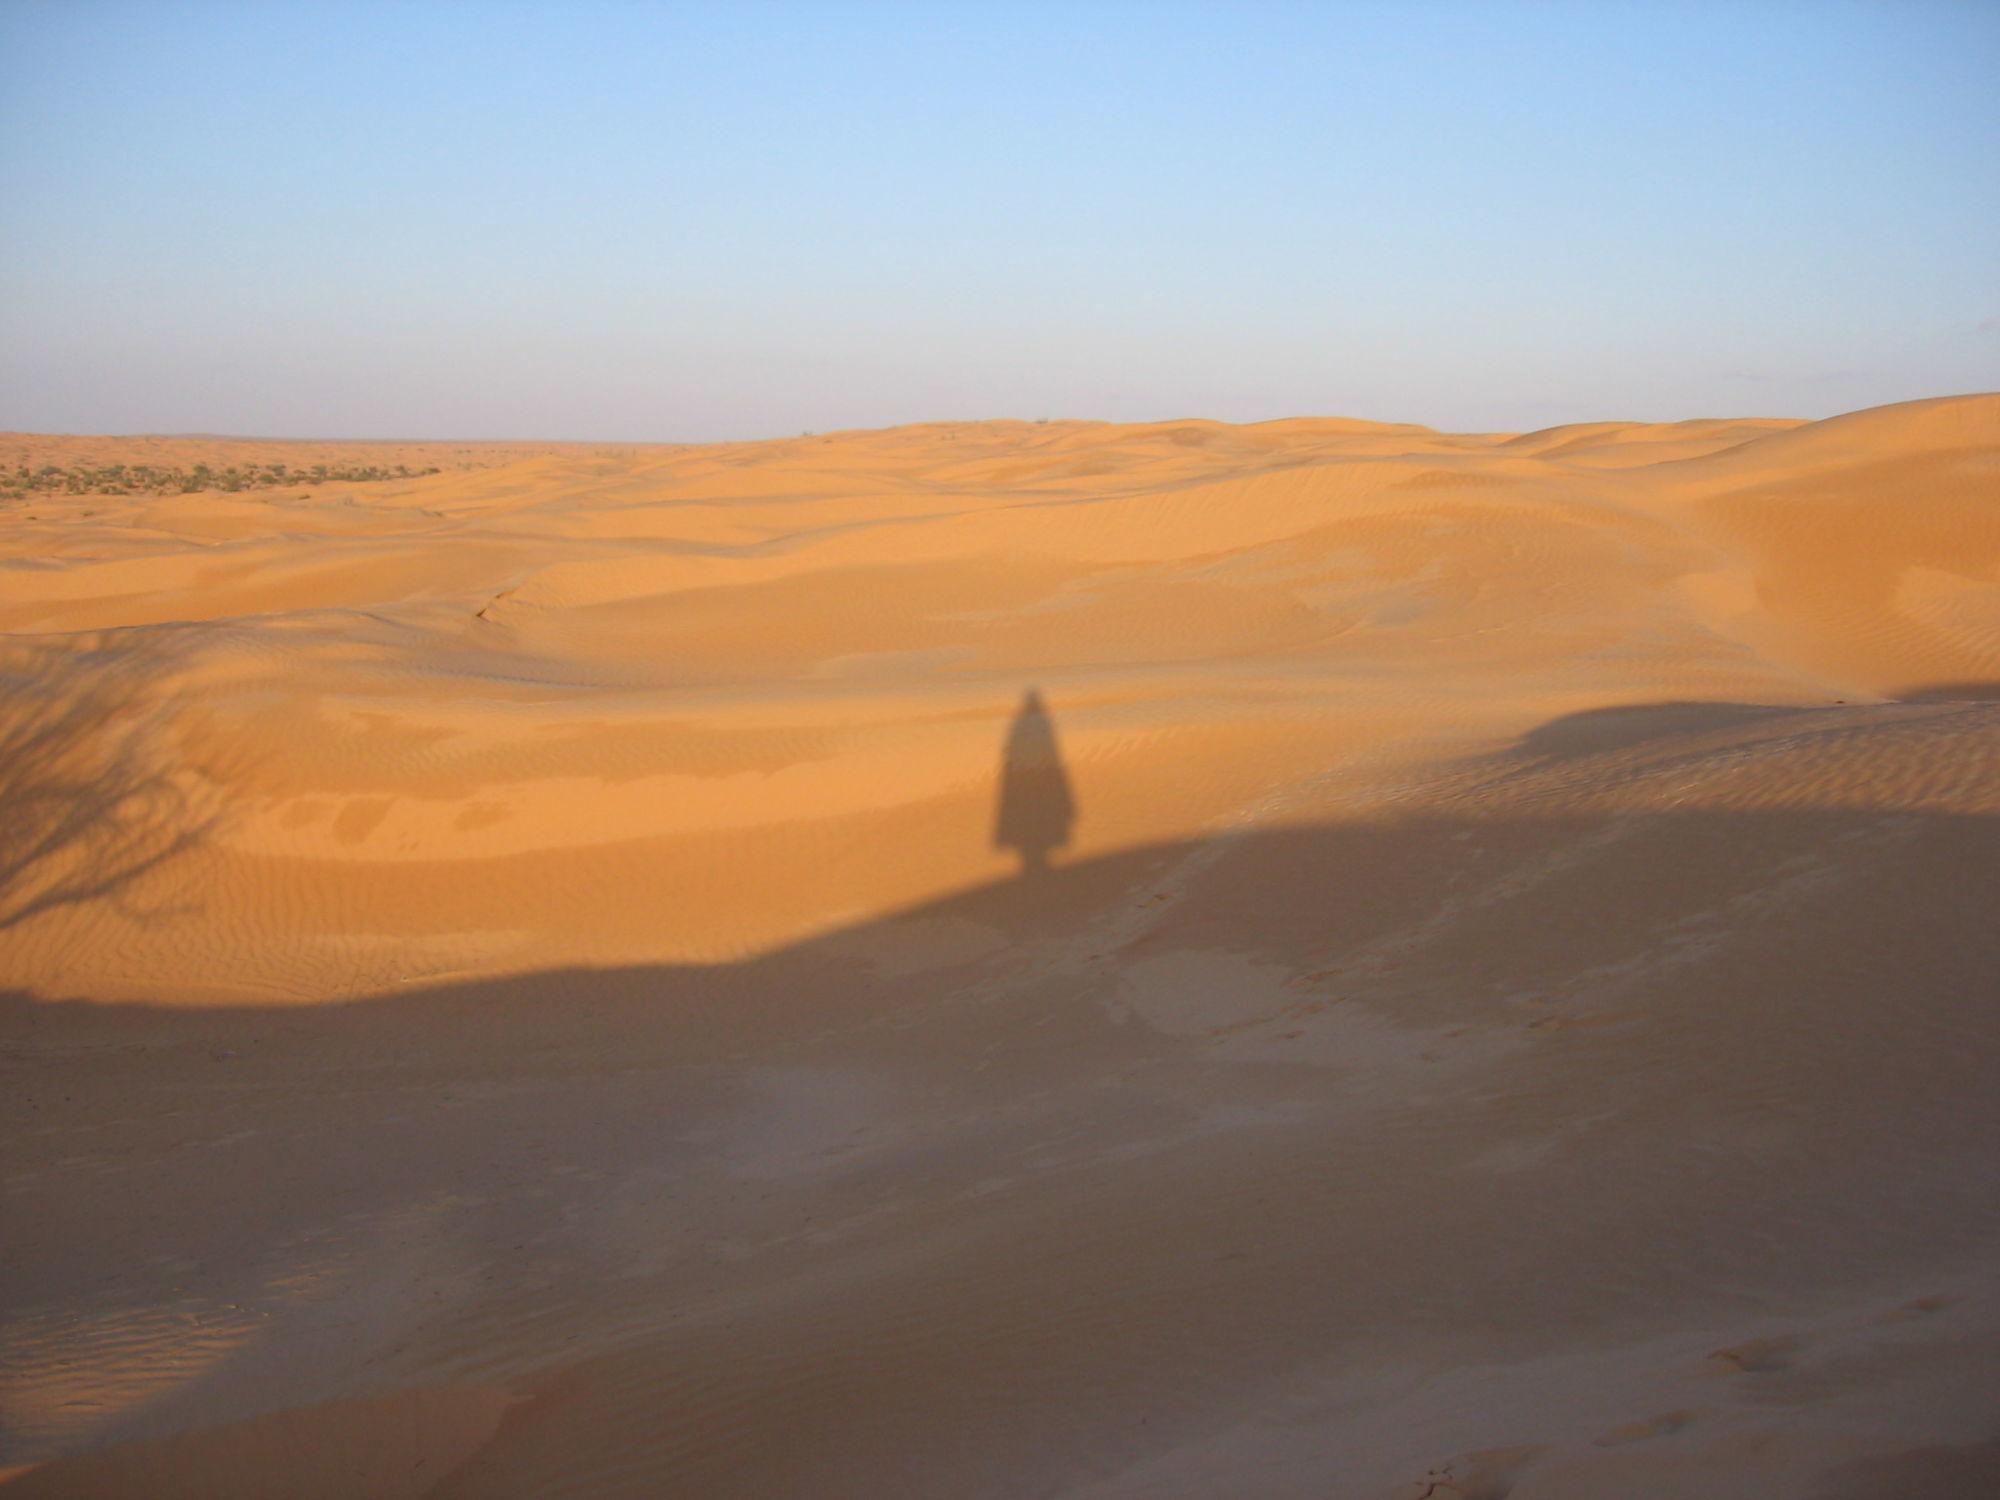 stín poutníka nasahaře - vision quest naSahaře 2012